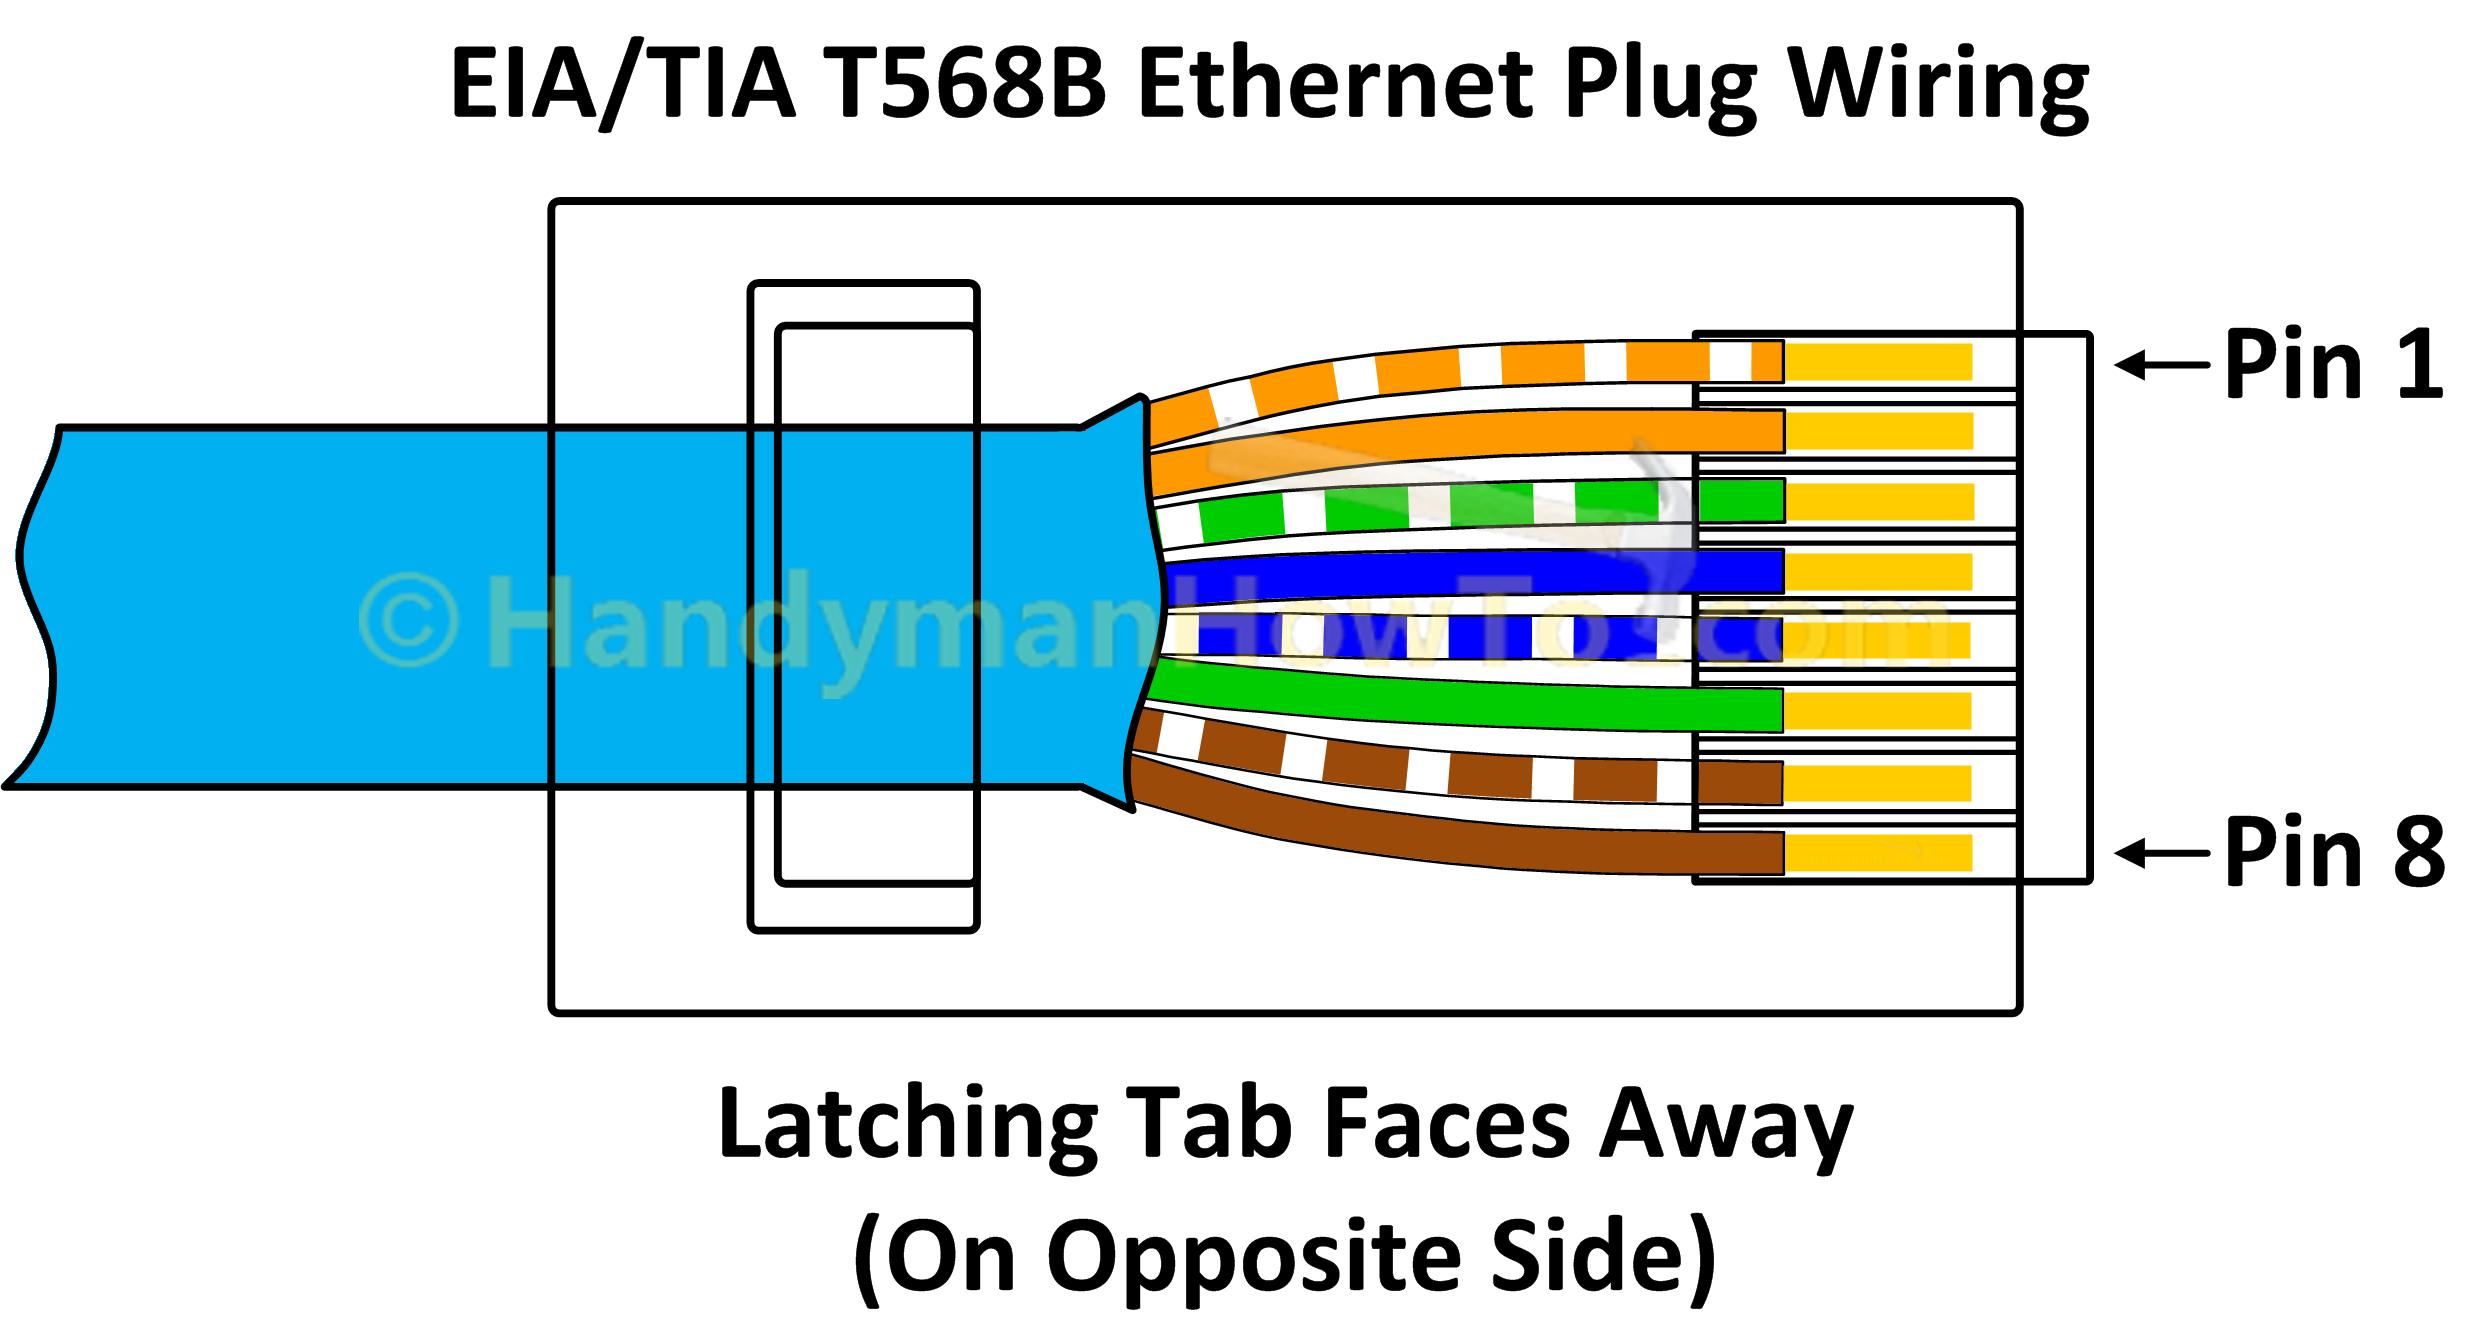 Tia 568B Wiring Schema - Wiring Diagram Data - 568 B Wiring Diagram